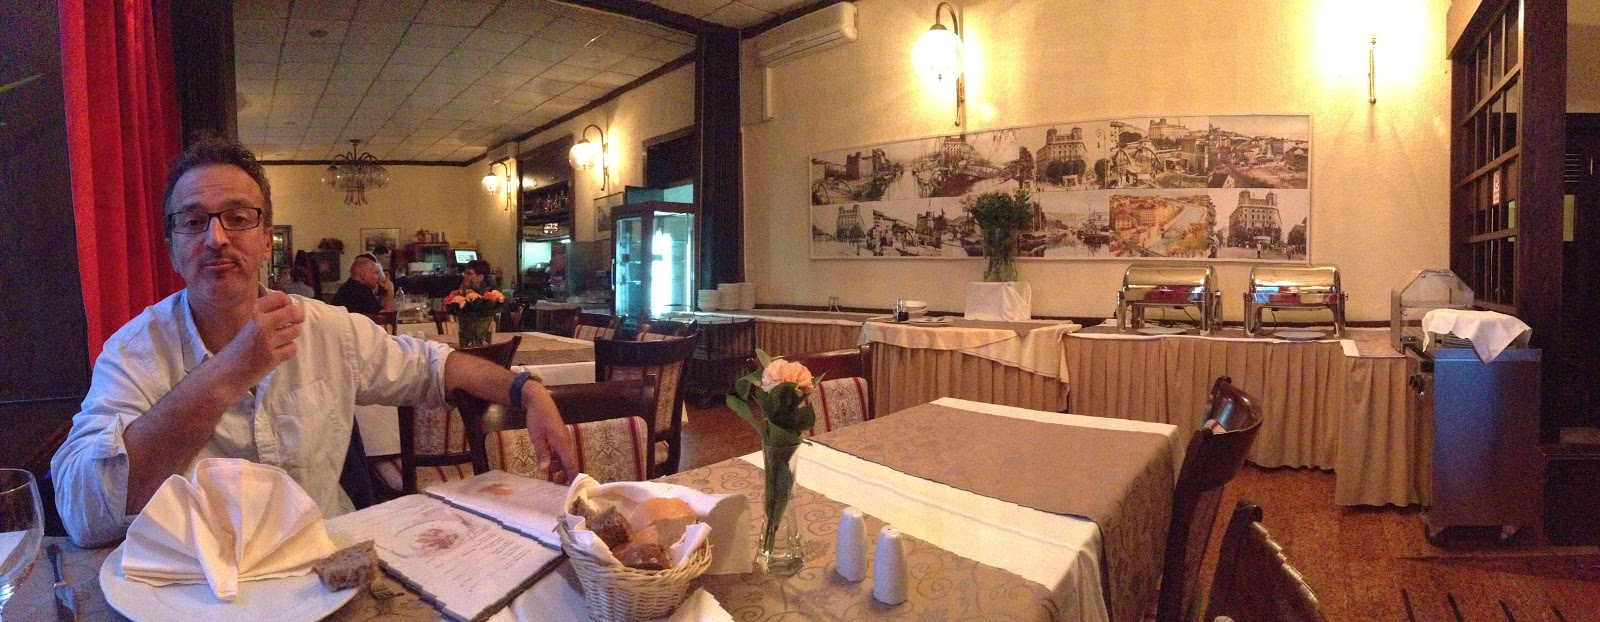 Hotel Continental Restaurant, Rijeka